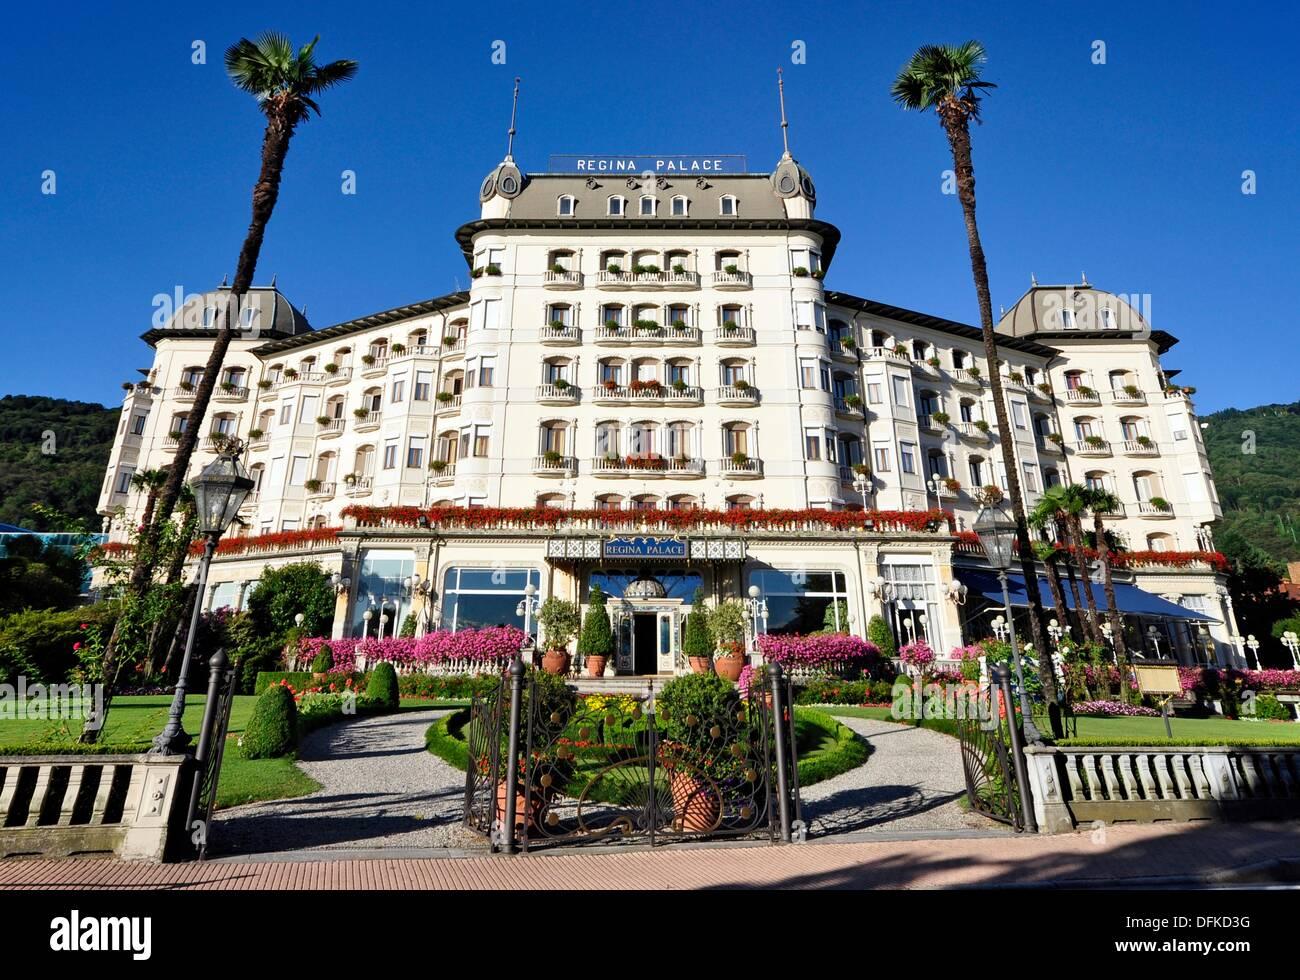 Regina Palace Hotel Stresa Lago Maggiore Italy Stock Photo Alamy